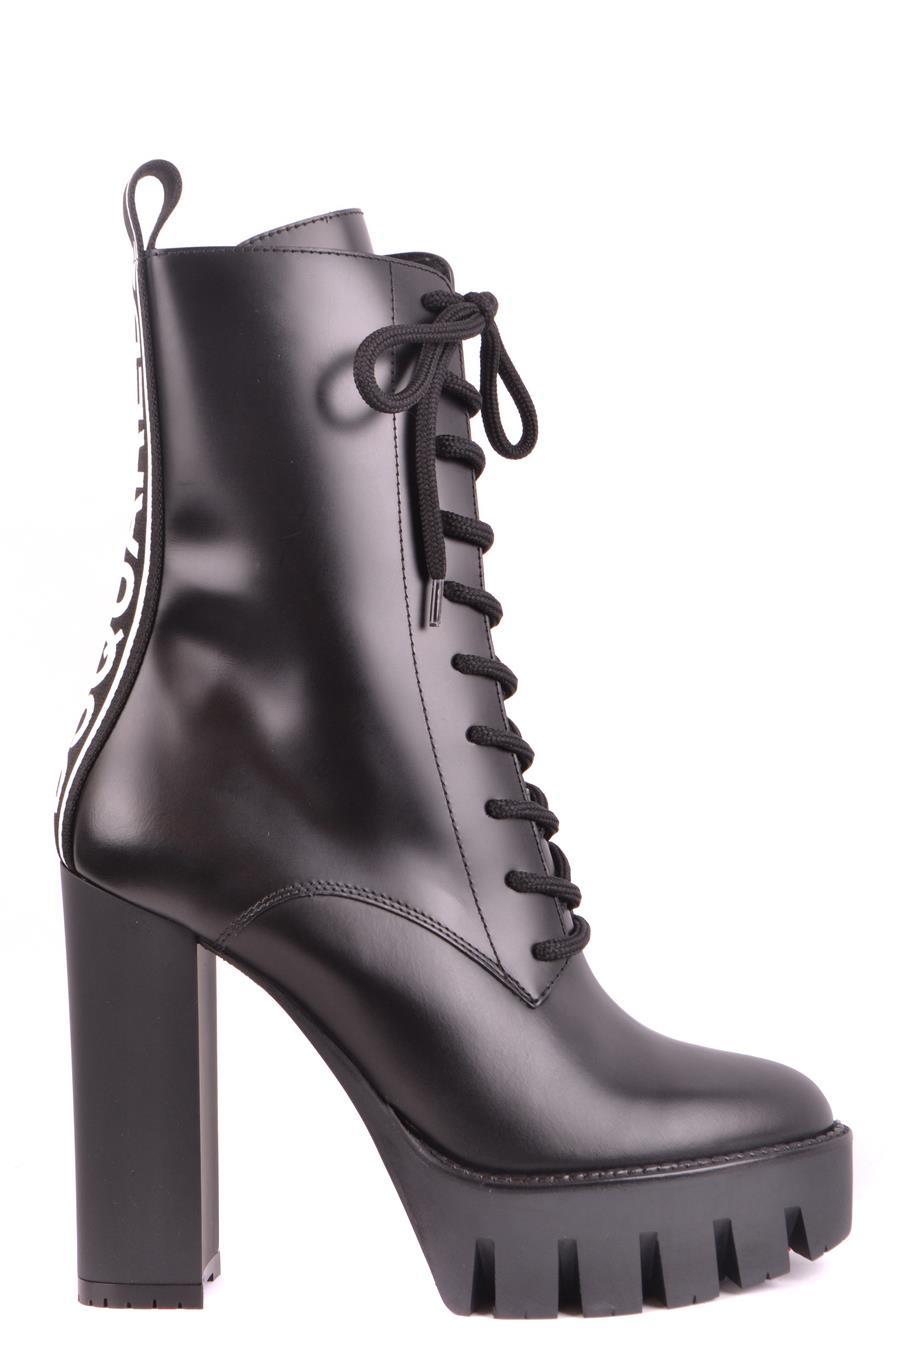 DSQUARED2 Boots   ViganoBoutique.com